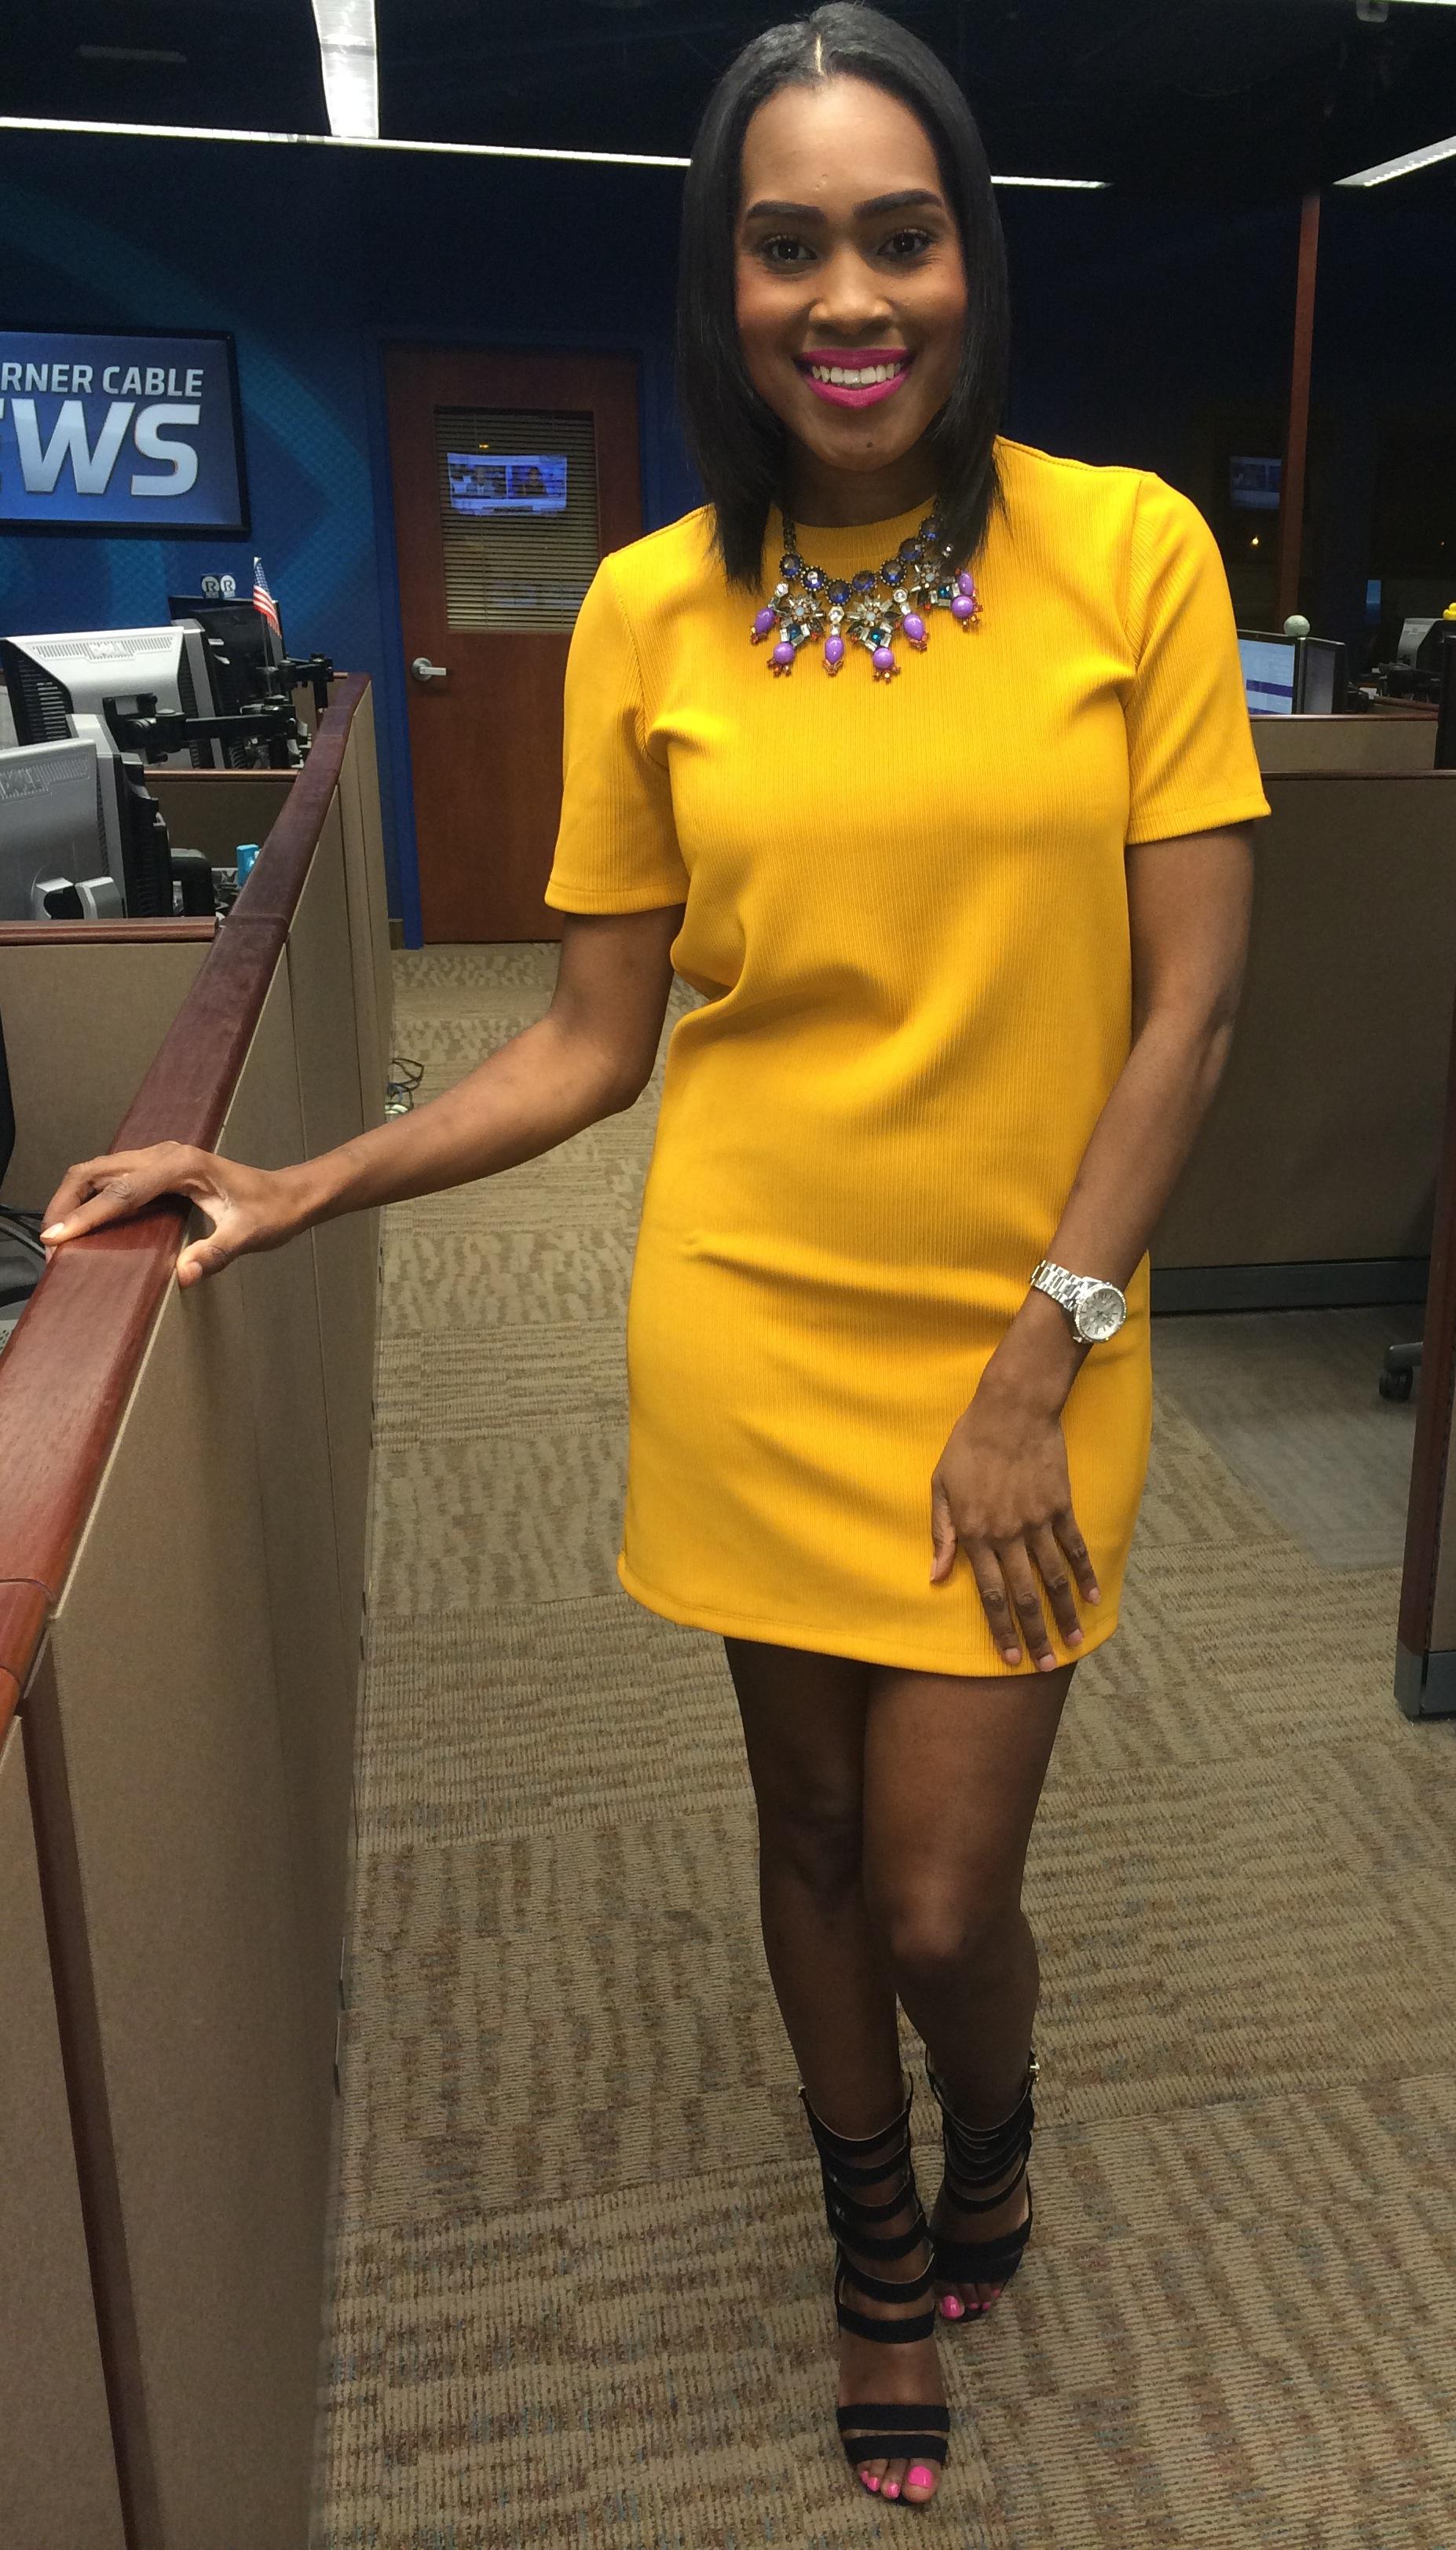 Style-files-forever-21-mustard-textured-stripe-shift-dress-justfab-florernce-heels-oohlalablog-workwear-5